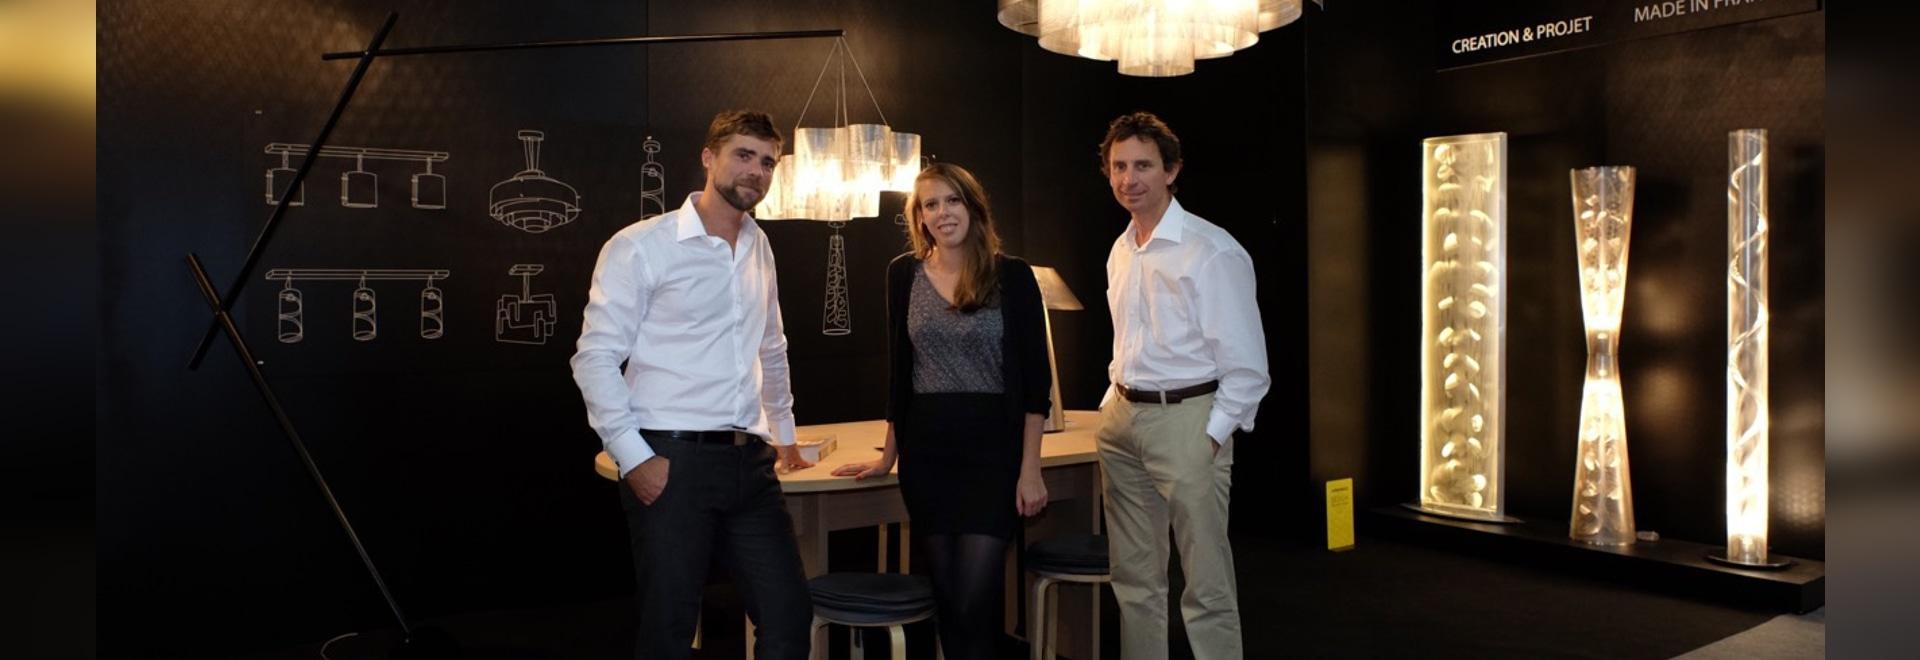 Maison & Objet dal ventesimo al 24 gennaio 2017